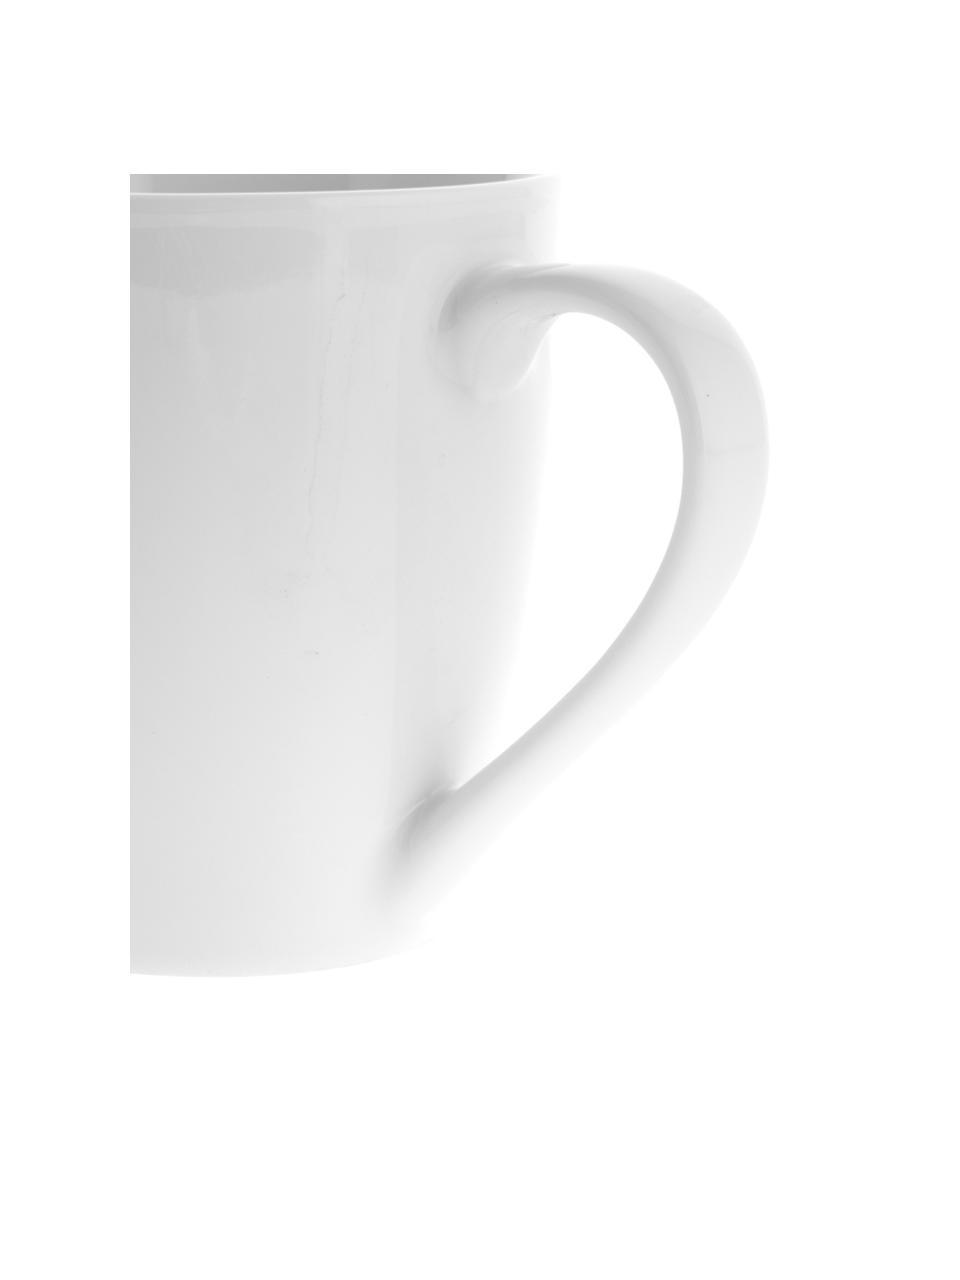 Tazza in porcellana bianca Delight 2 pz, Porcellana, Bianco, Ø 9 x Alt. 10 cm